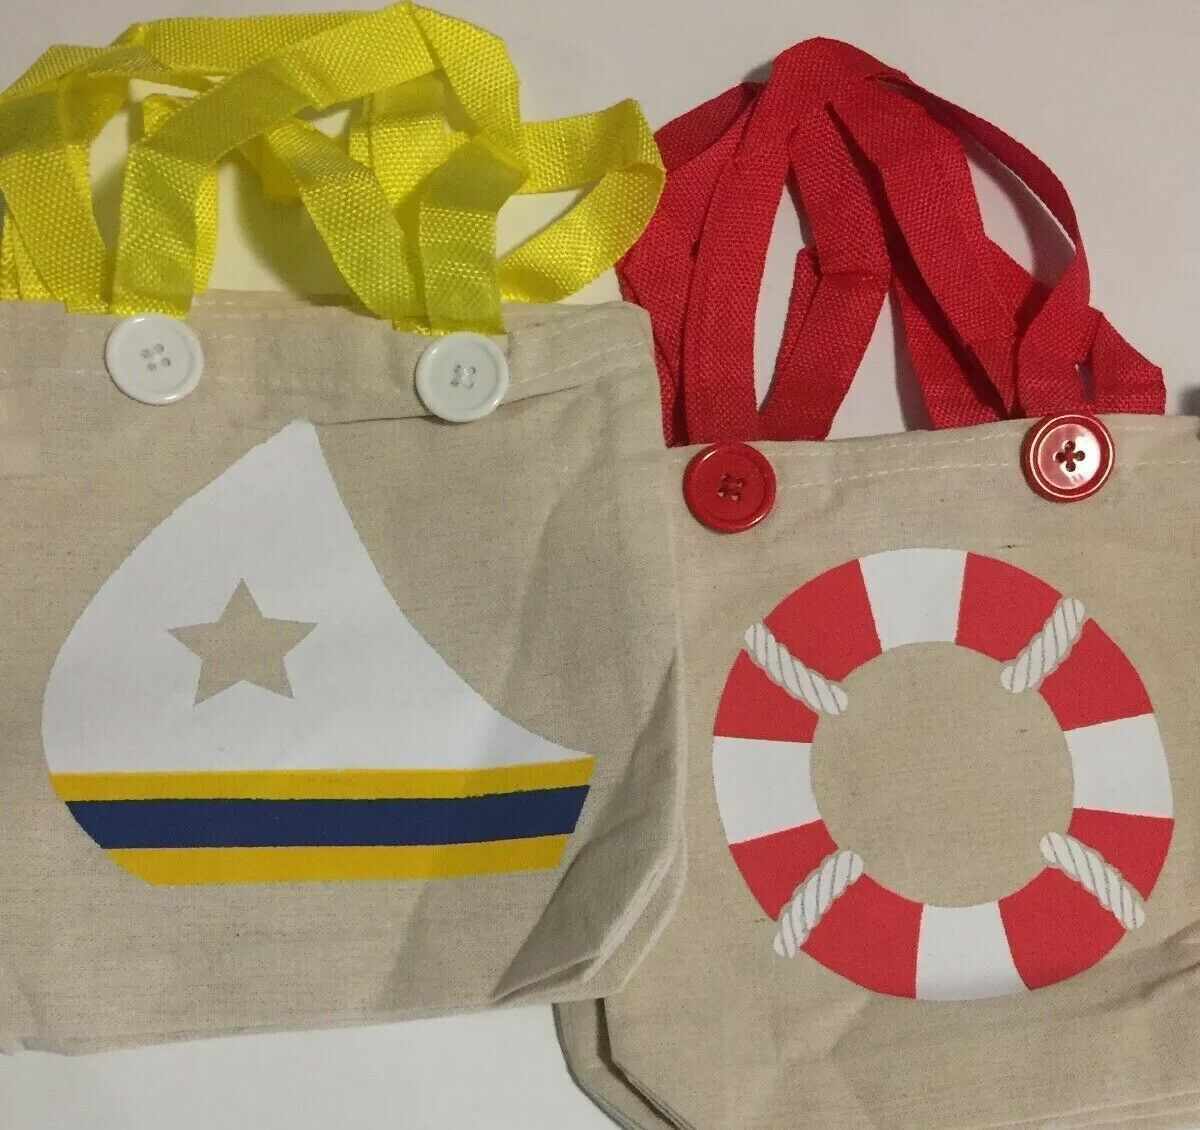 Fun Express Nautical Theme Canvas Small Tote Bags - 1 Dozen